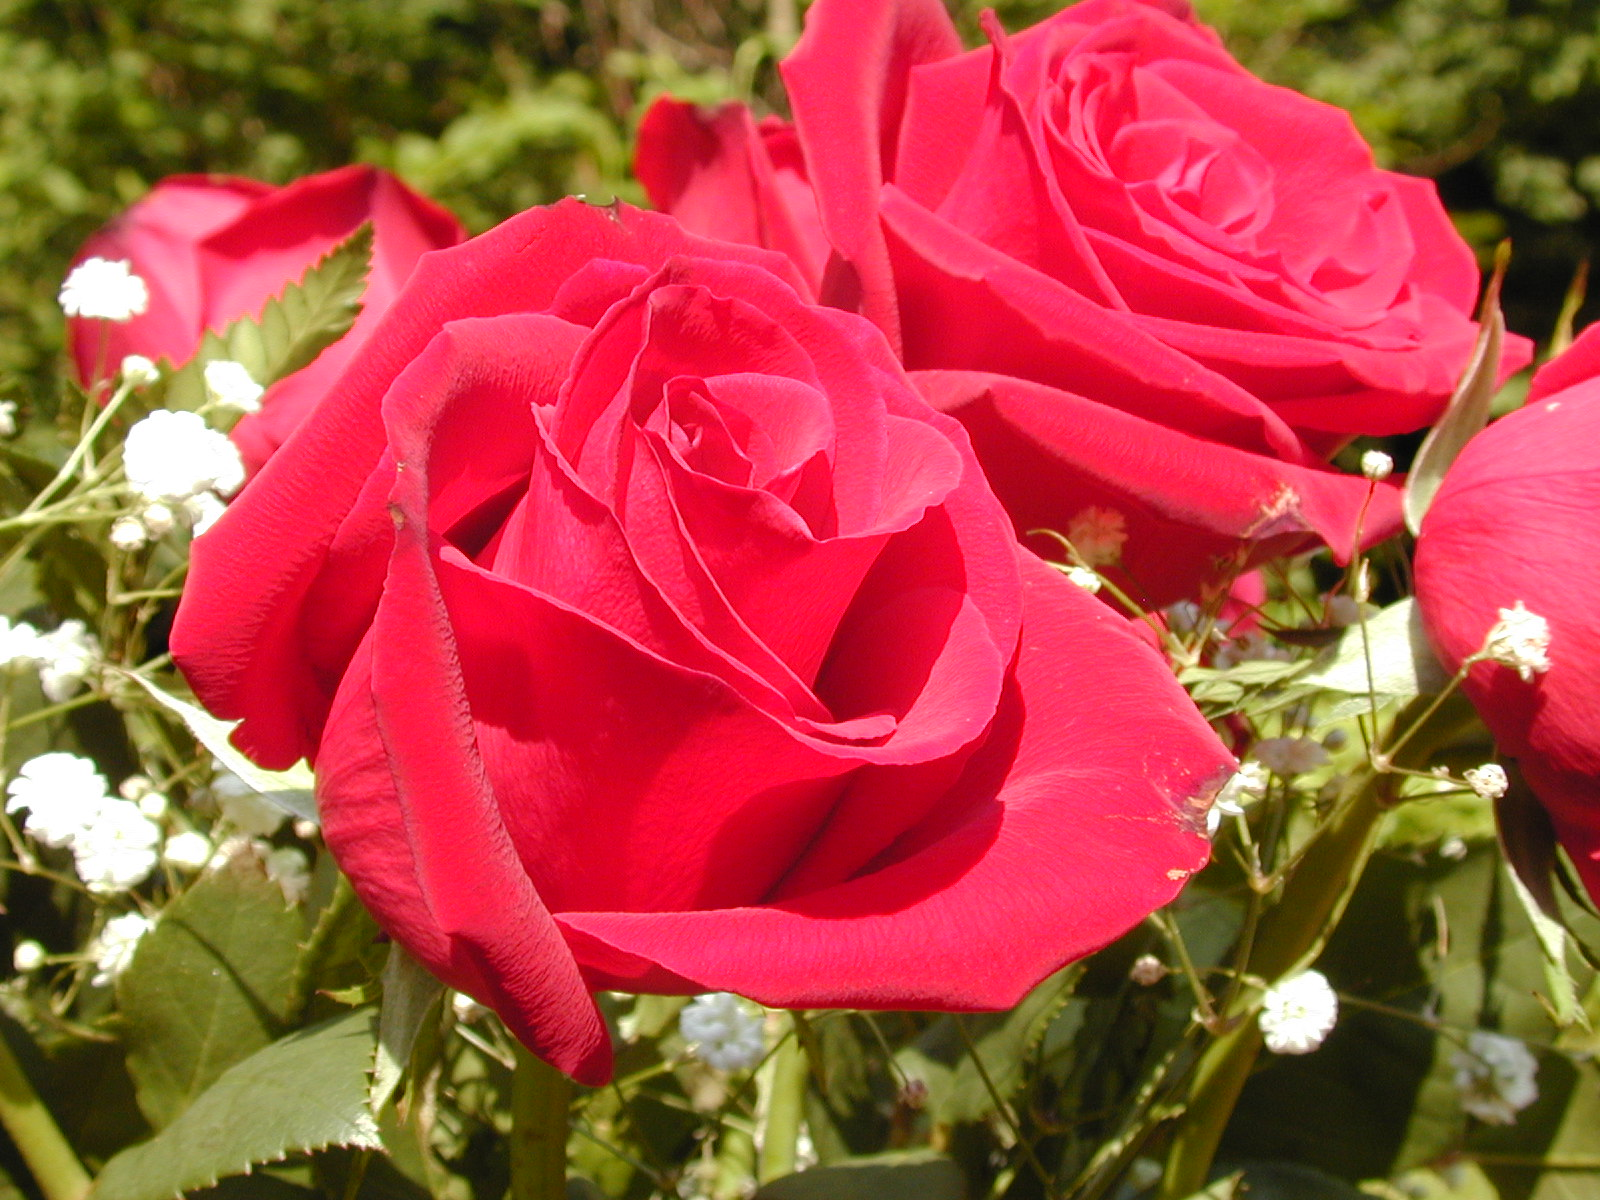 Free Download Gambar Bunga Mawar Hd Wallpaper Myideasbedroom Com